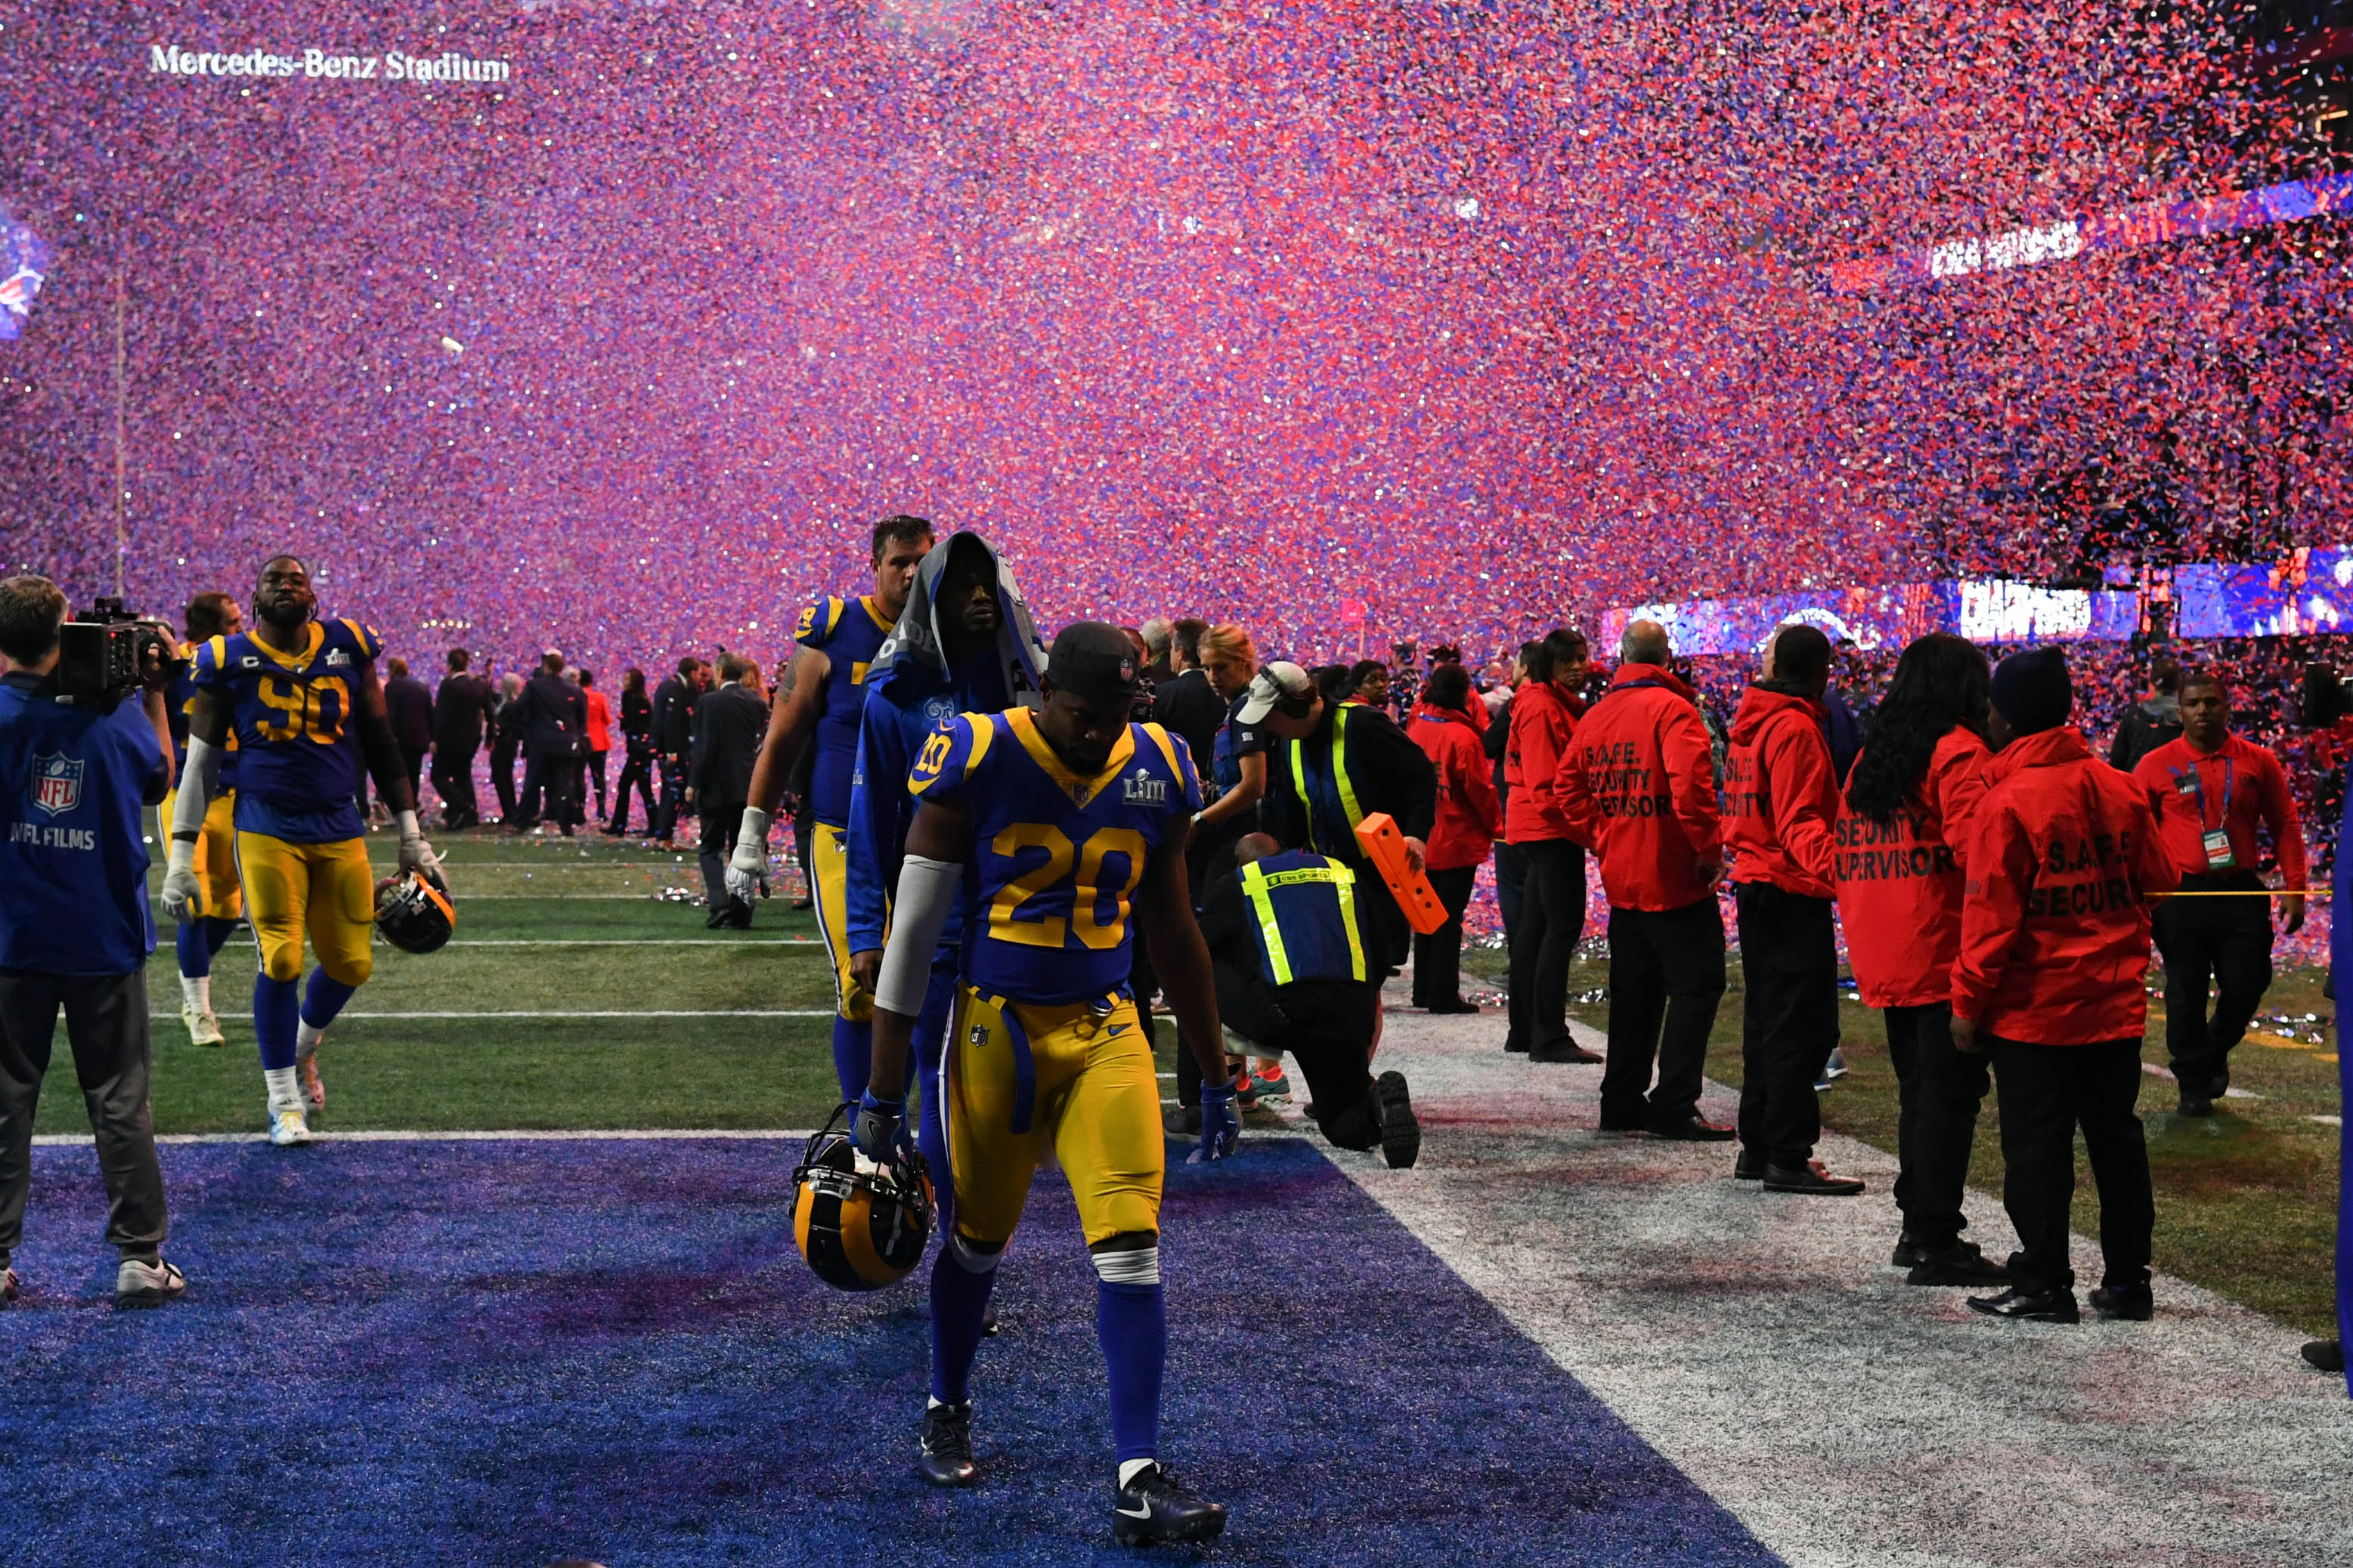 Los Angeles Rams S Lamarcus Joyner walks off the field after Super Bowl LIII against the New England Patriots, Feb. 3, 2019.